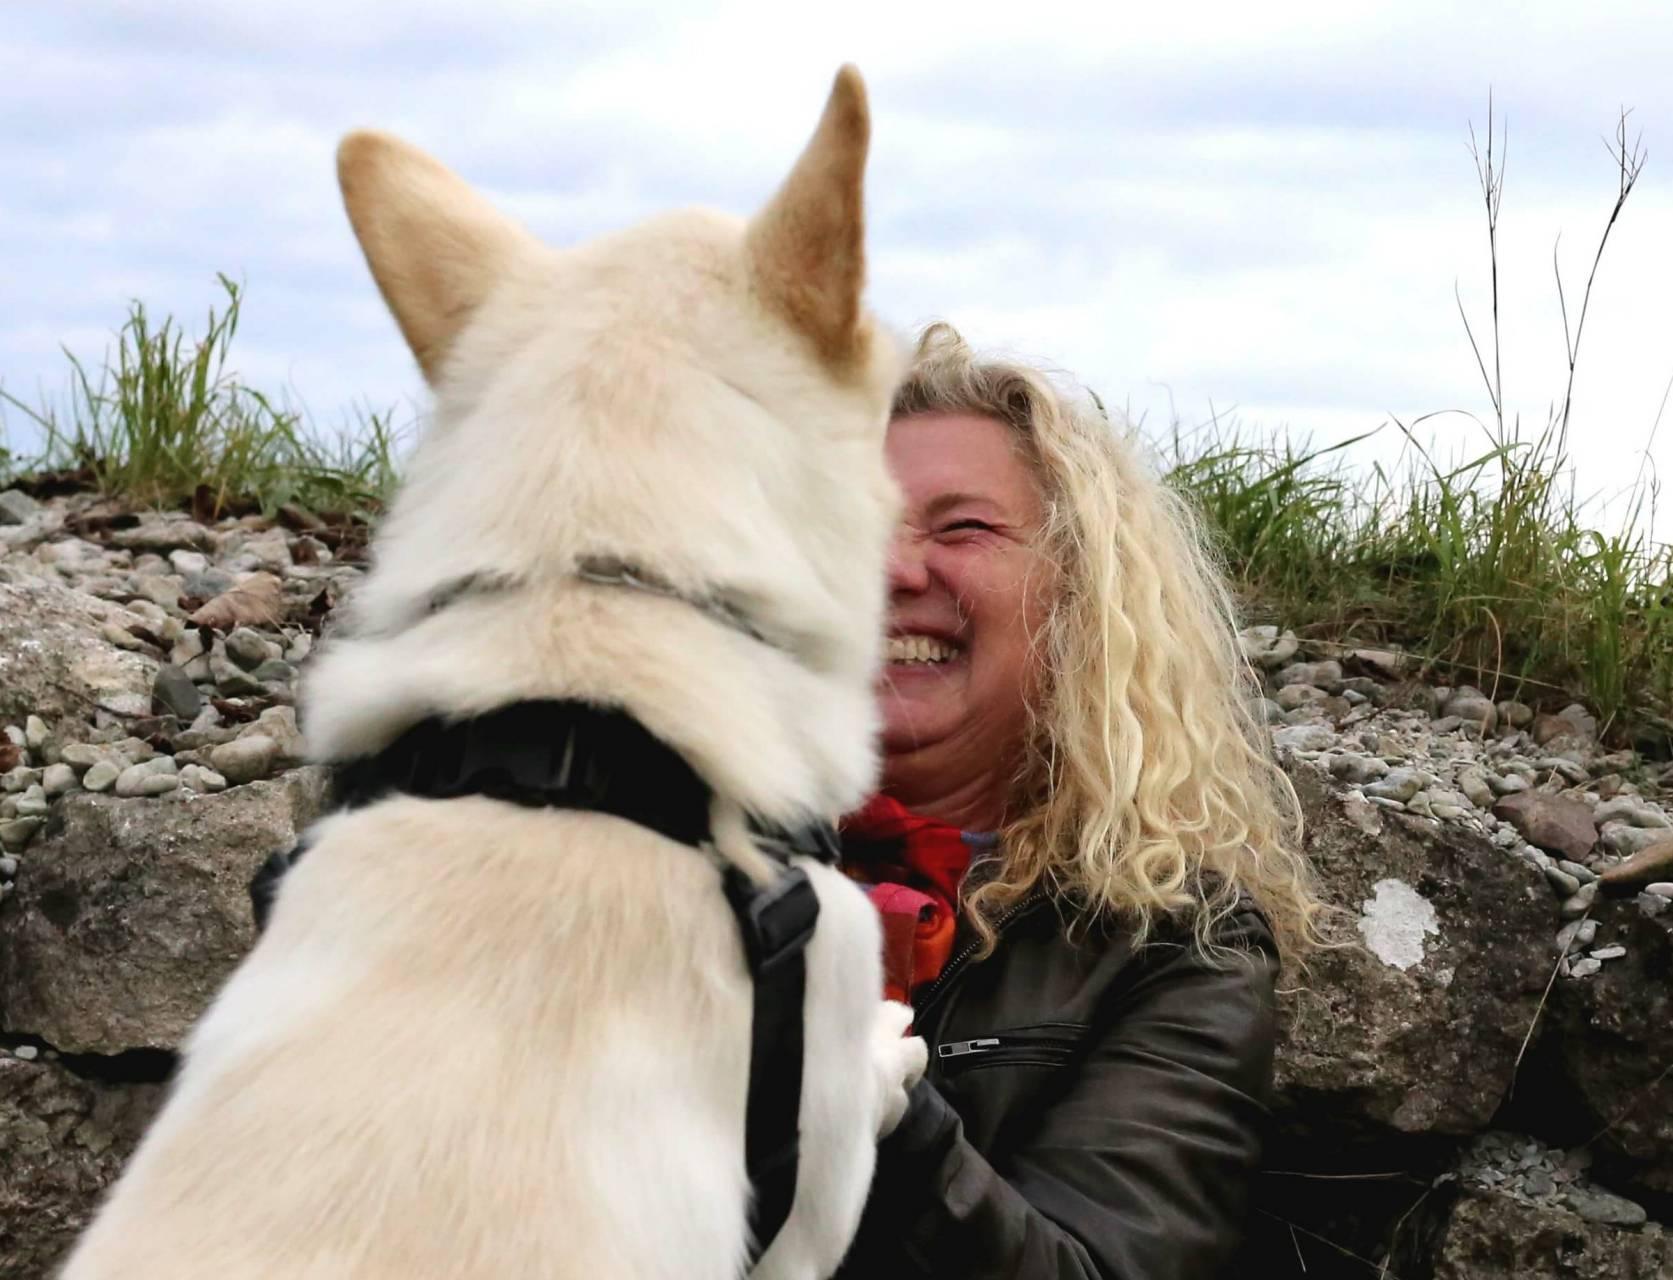 Hundkärlek: När Sagan Blev Sann